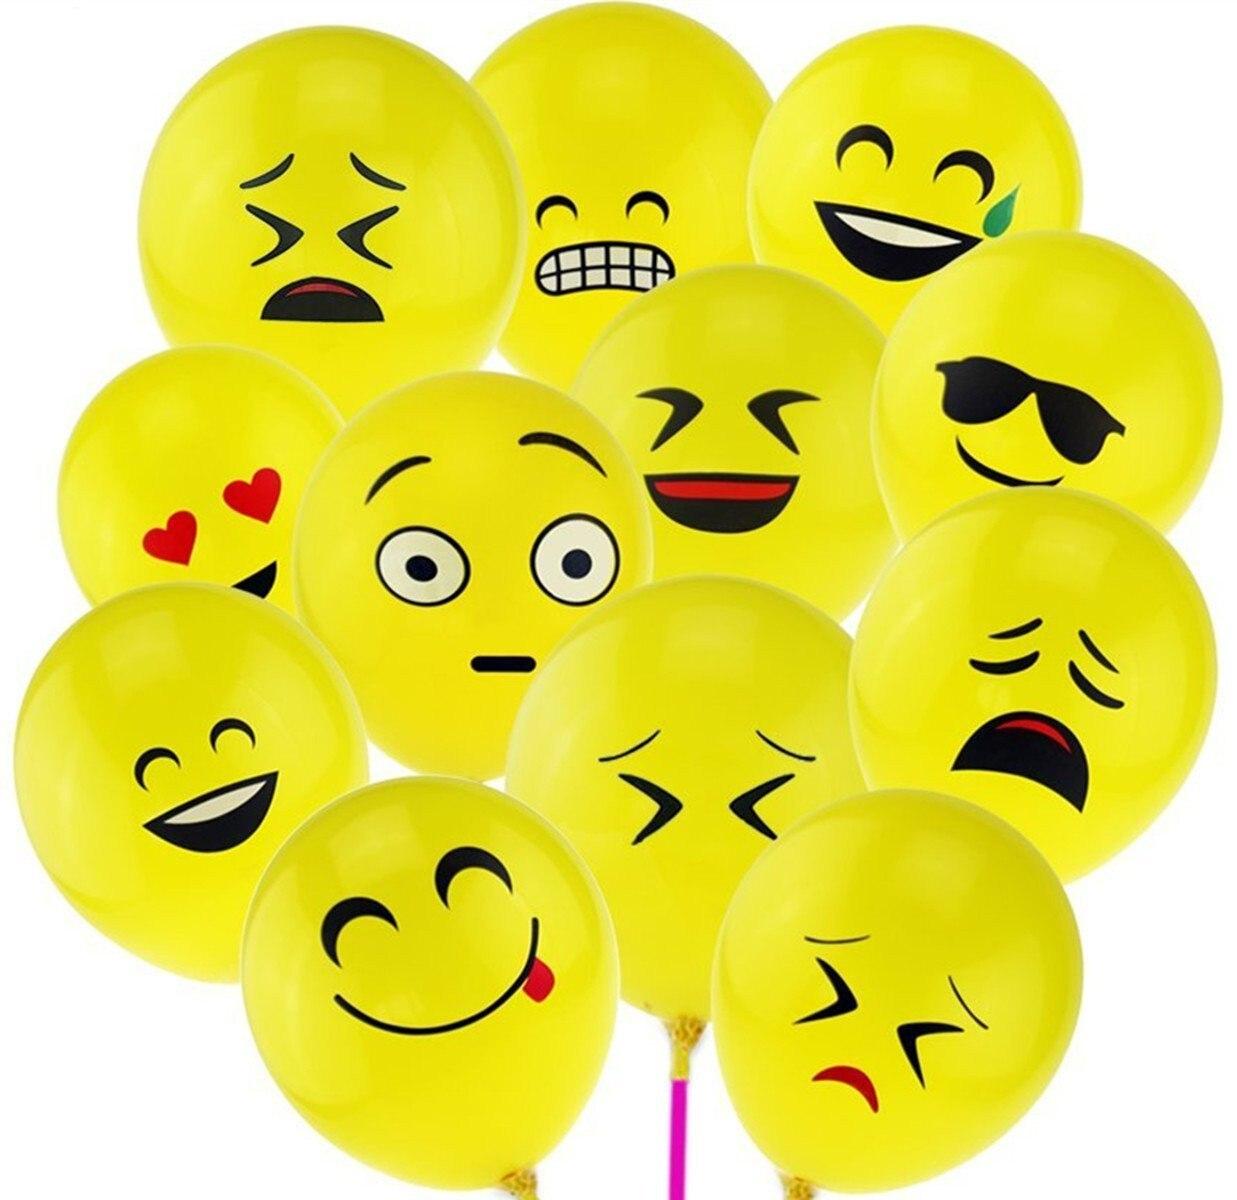 100pcs Emoji Balloons Smiley Face Expression Yellow Latex Balloons Cartoon Inflatable Balls 12 cute Cartoon Expression Balloon